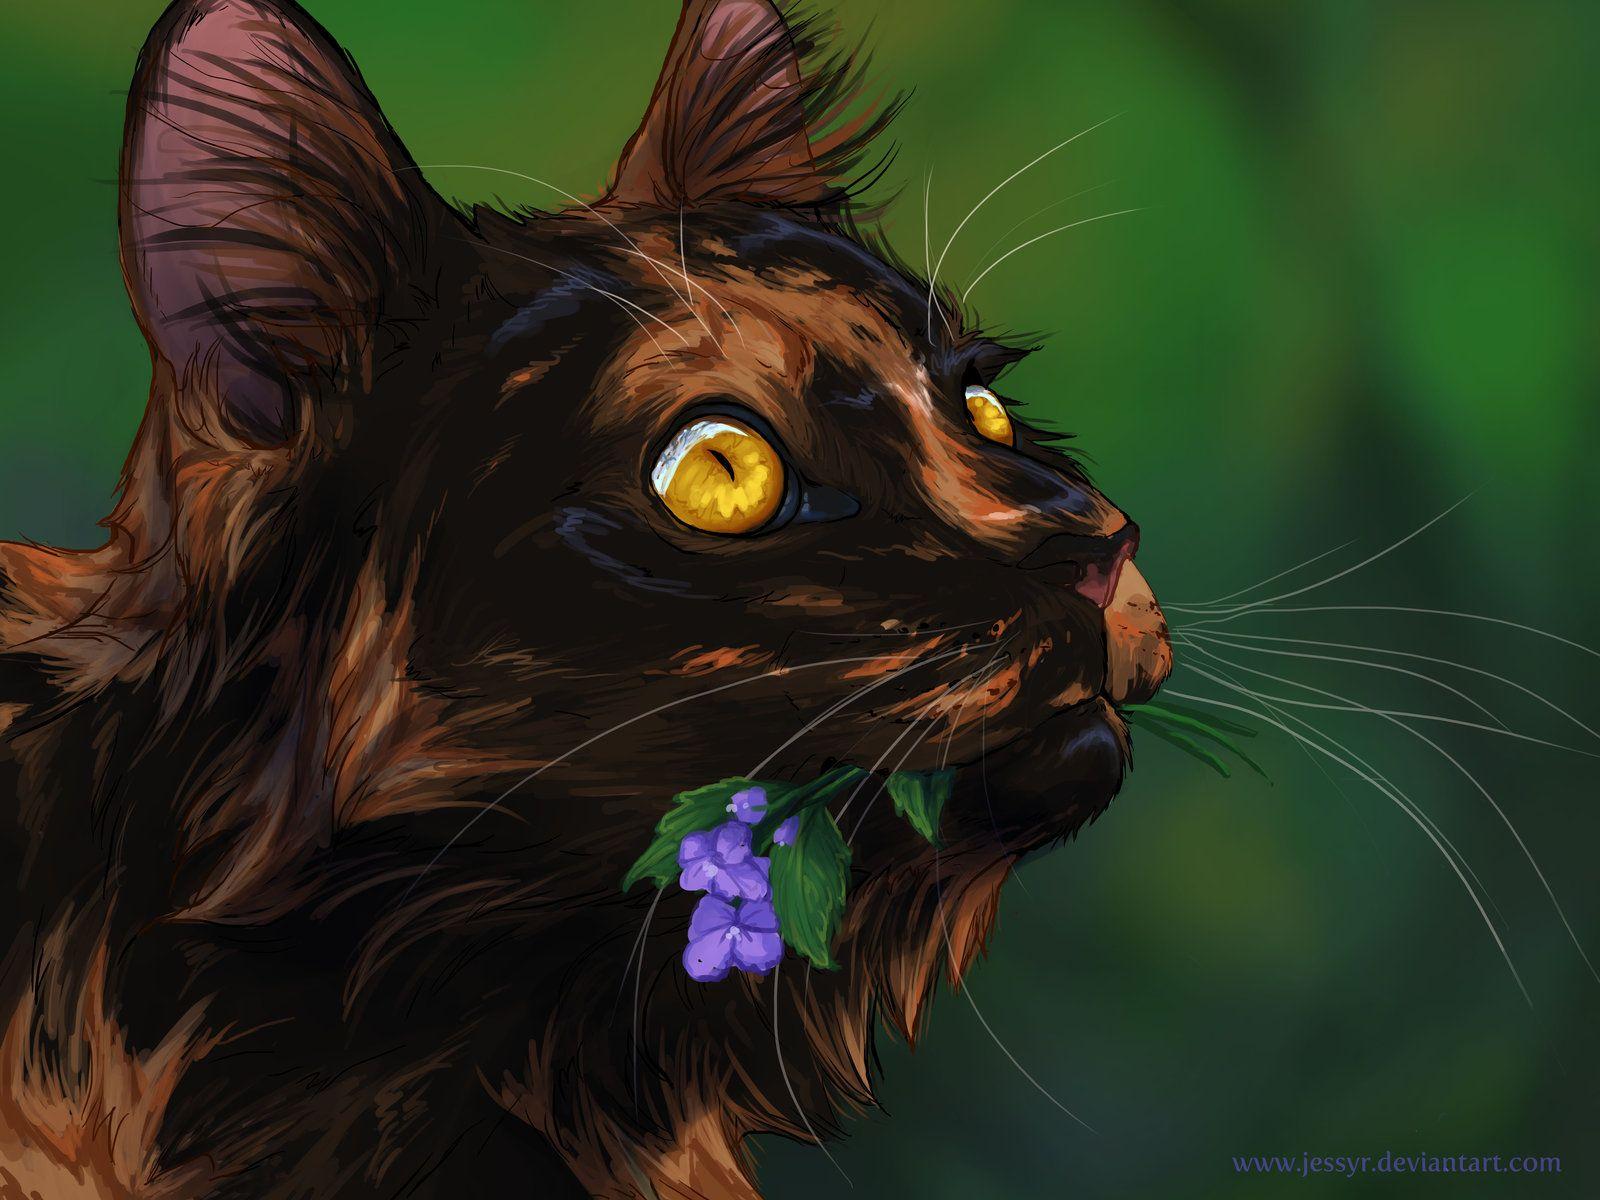 The Most Lovely Spottedleaf Anime Katze Warrior Cats Katzen